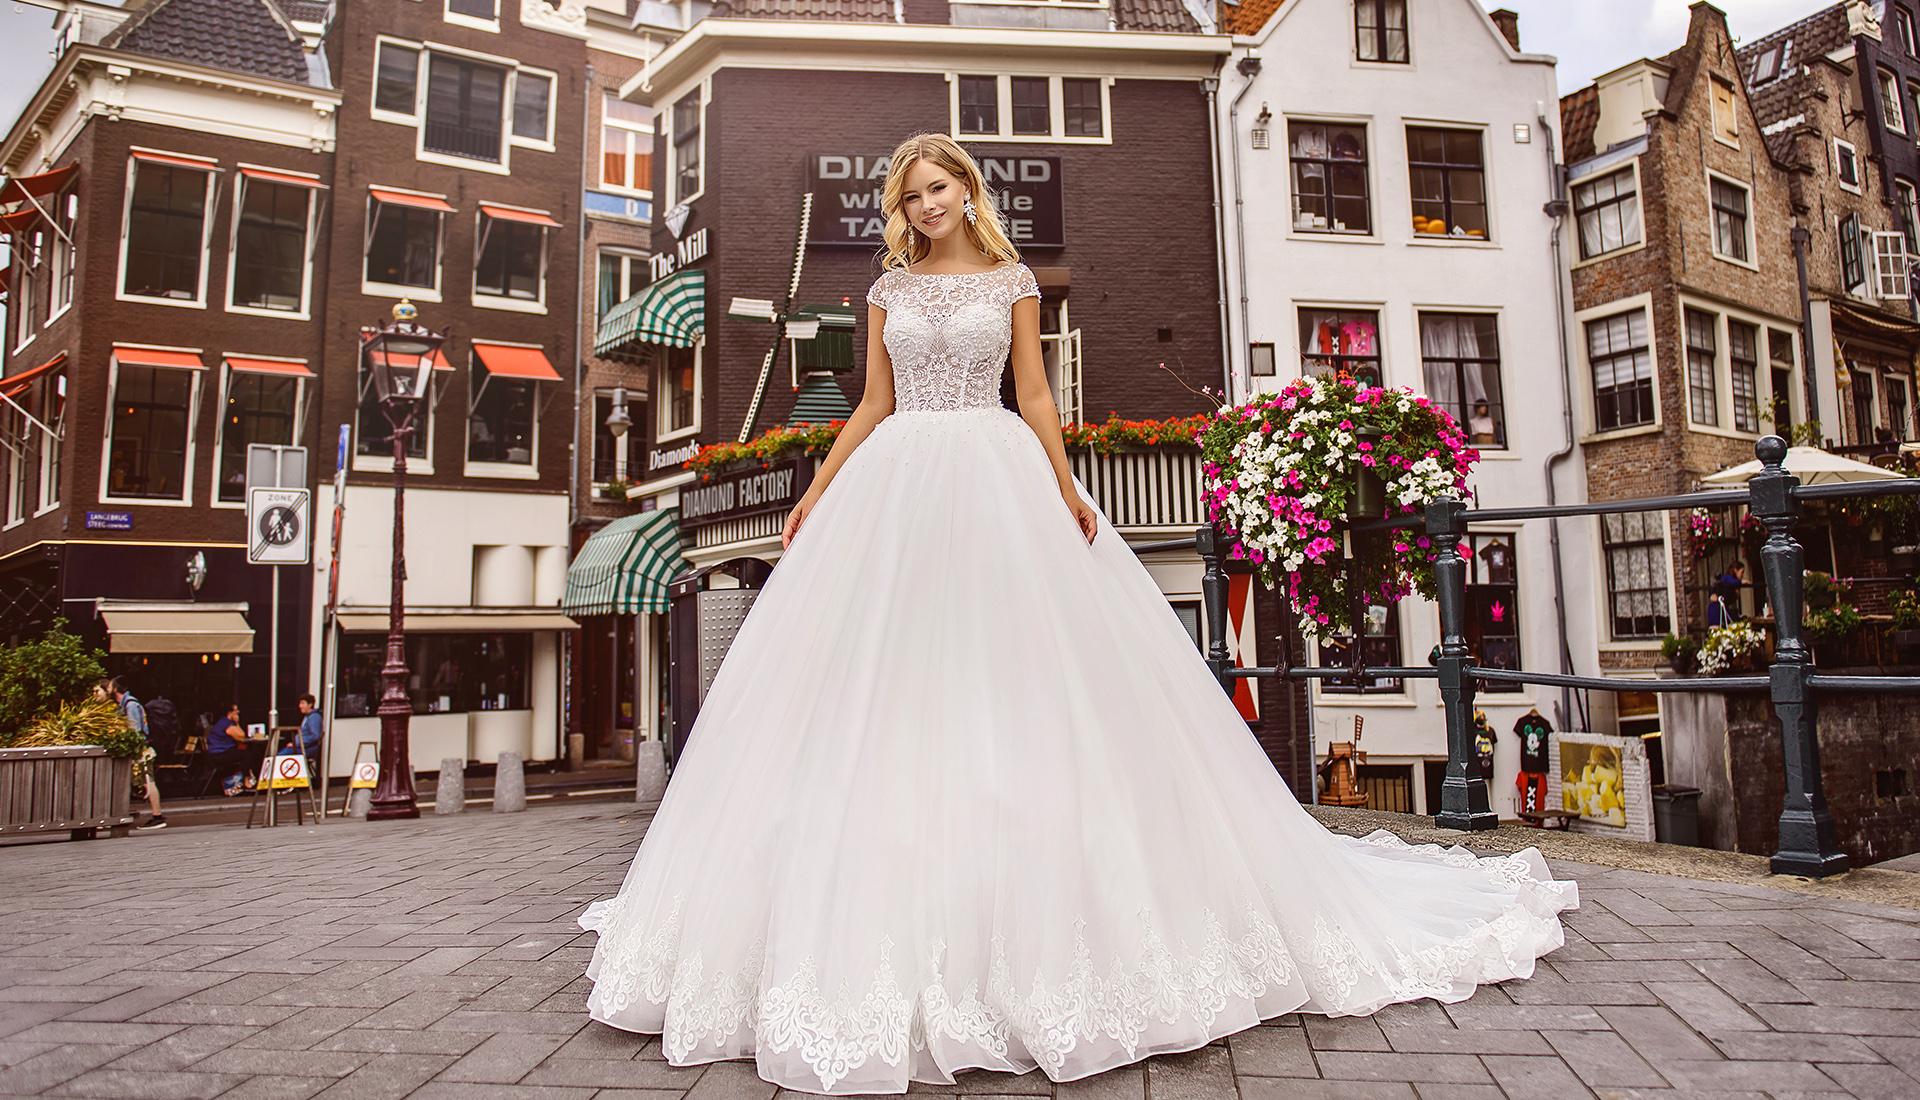 Tina Valerdi 2019 Wedding Dresses: Buy Wedding Dresses Wholesale From The